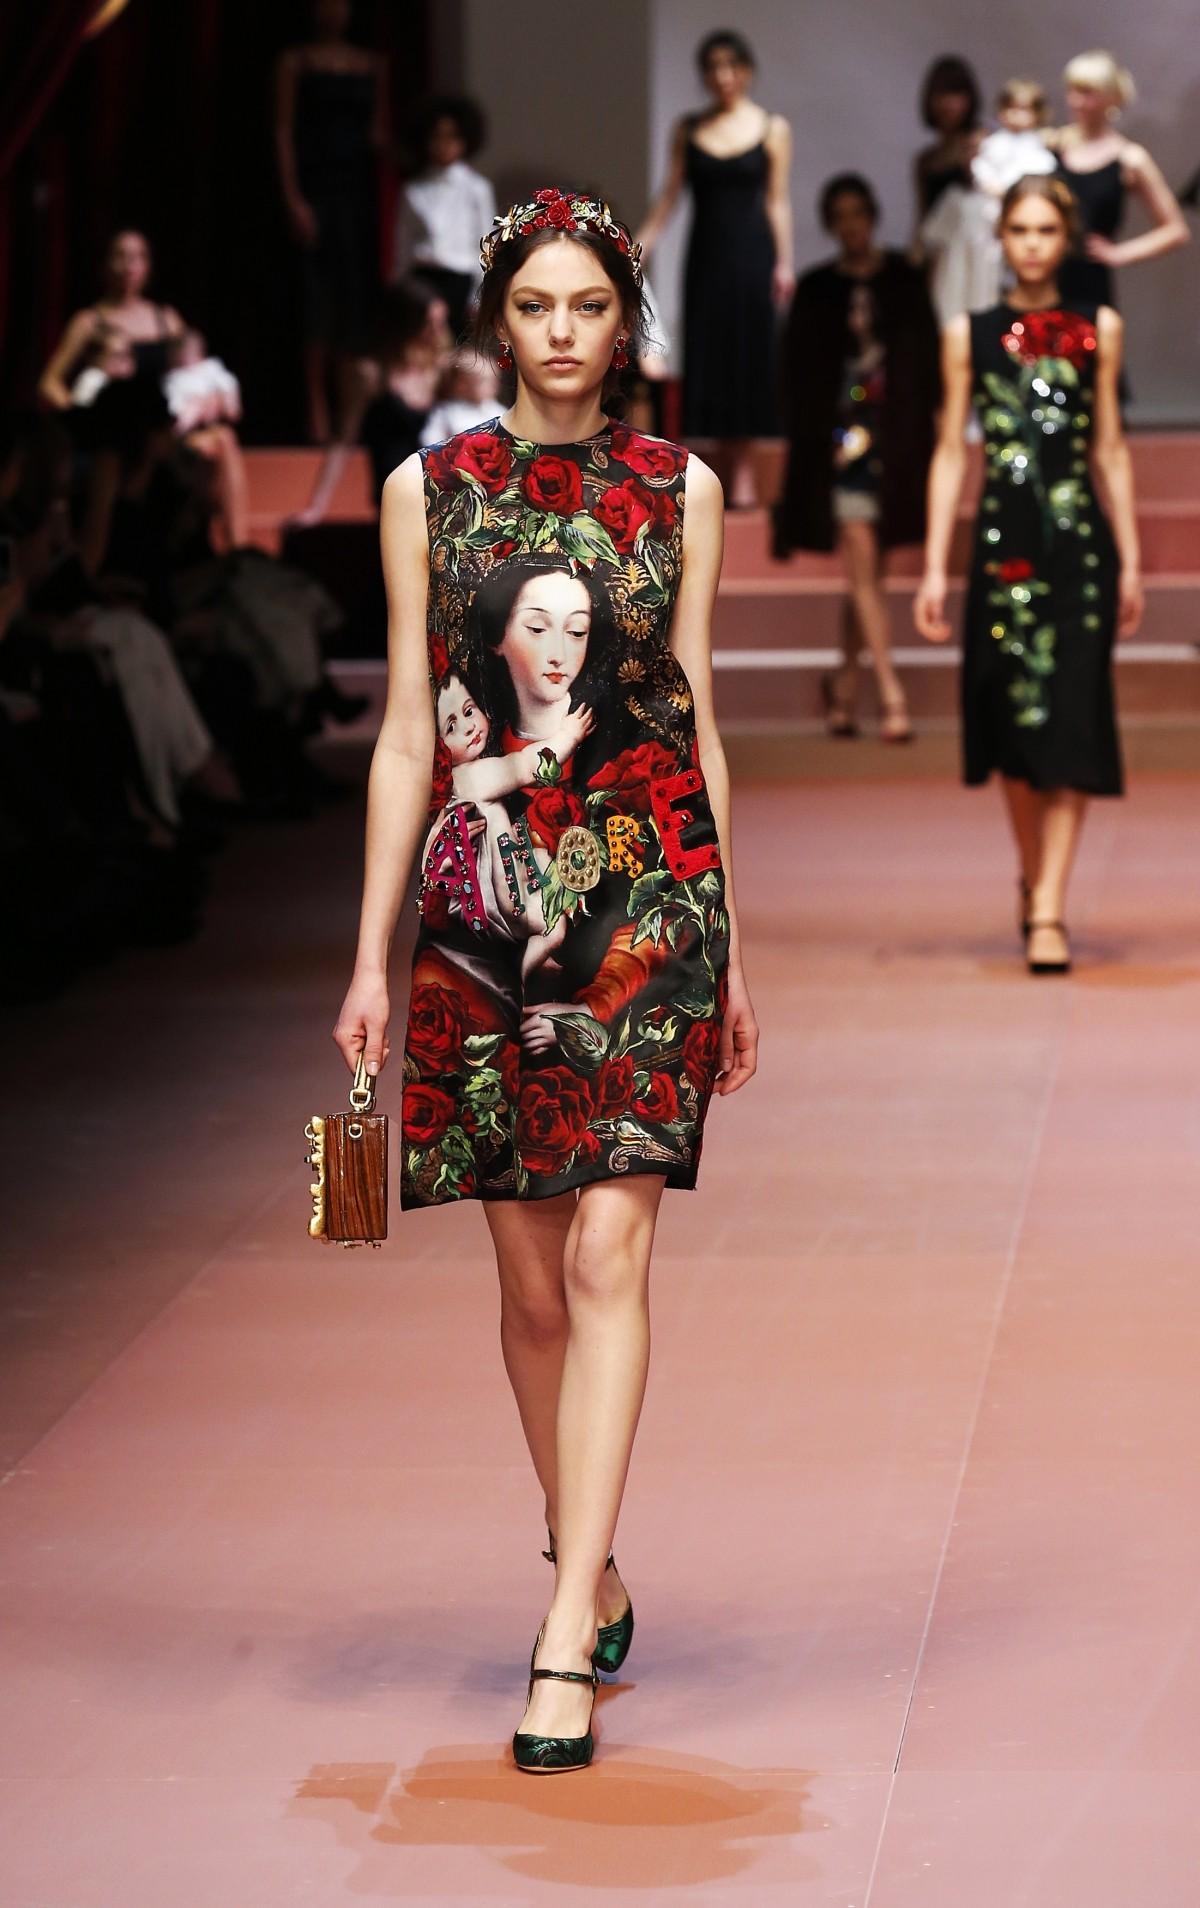 Milan Fashion Week 2015: Pregnant Models Walk the Ramp for ...